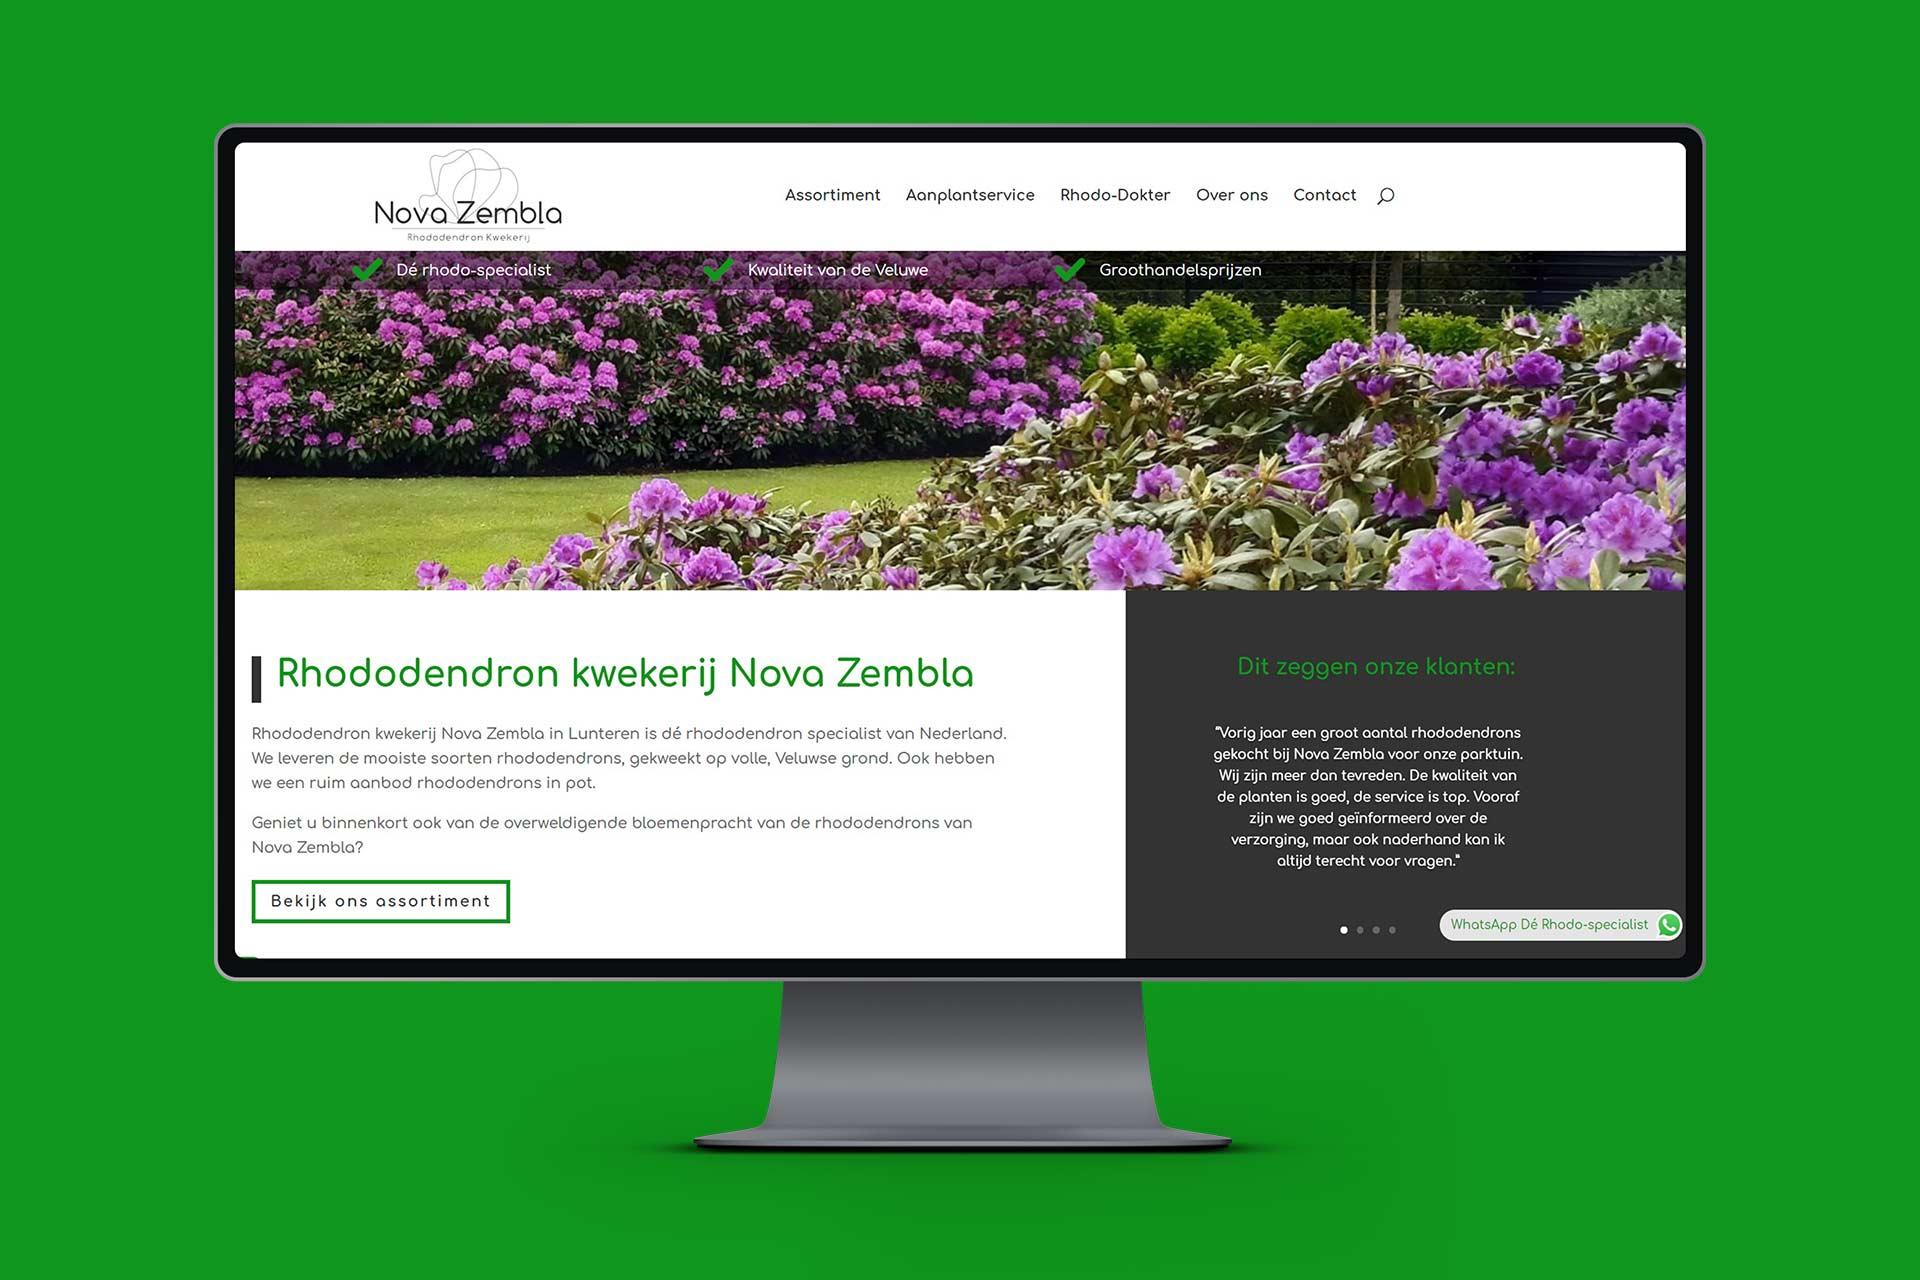 Rhododendron kwekerij Nova Zembla 2